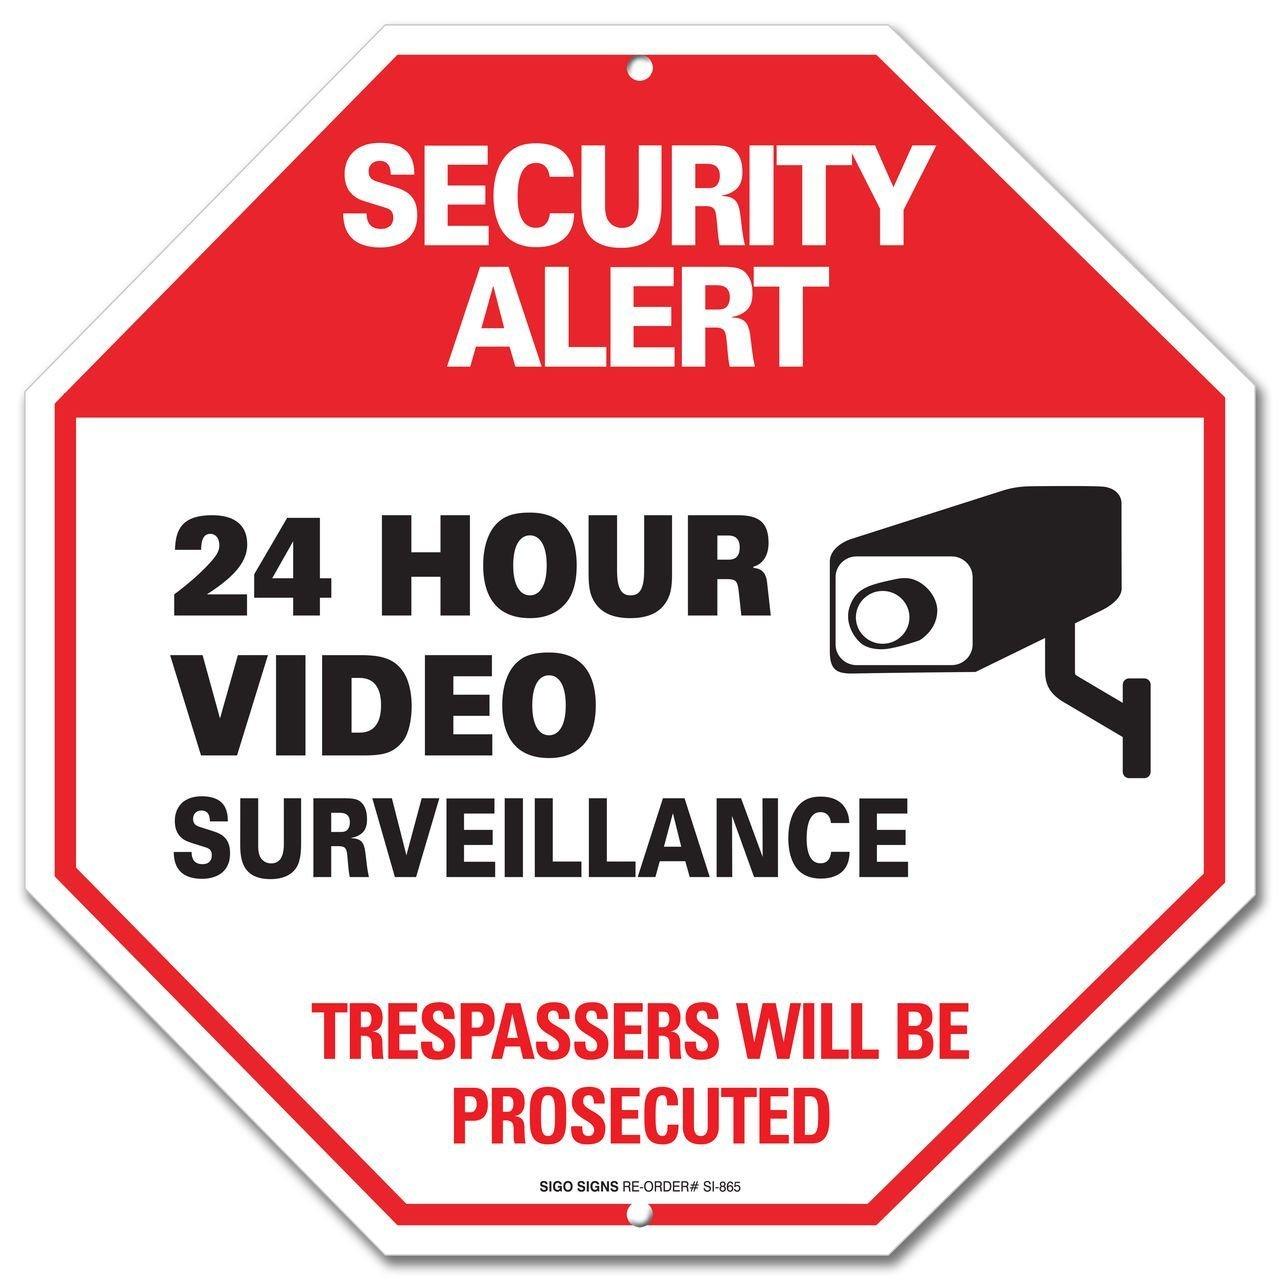 Amazon signs safety signs signals industrial scientific video surveillance buycottarizona Choice Image